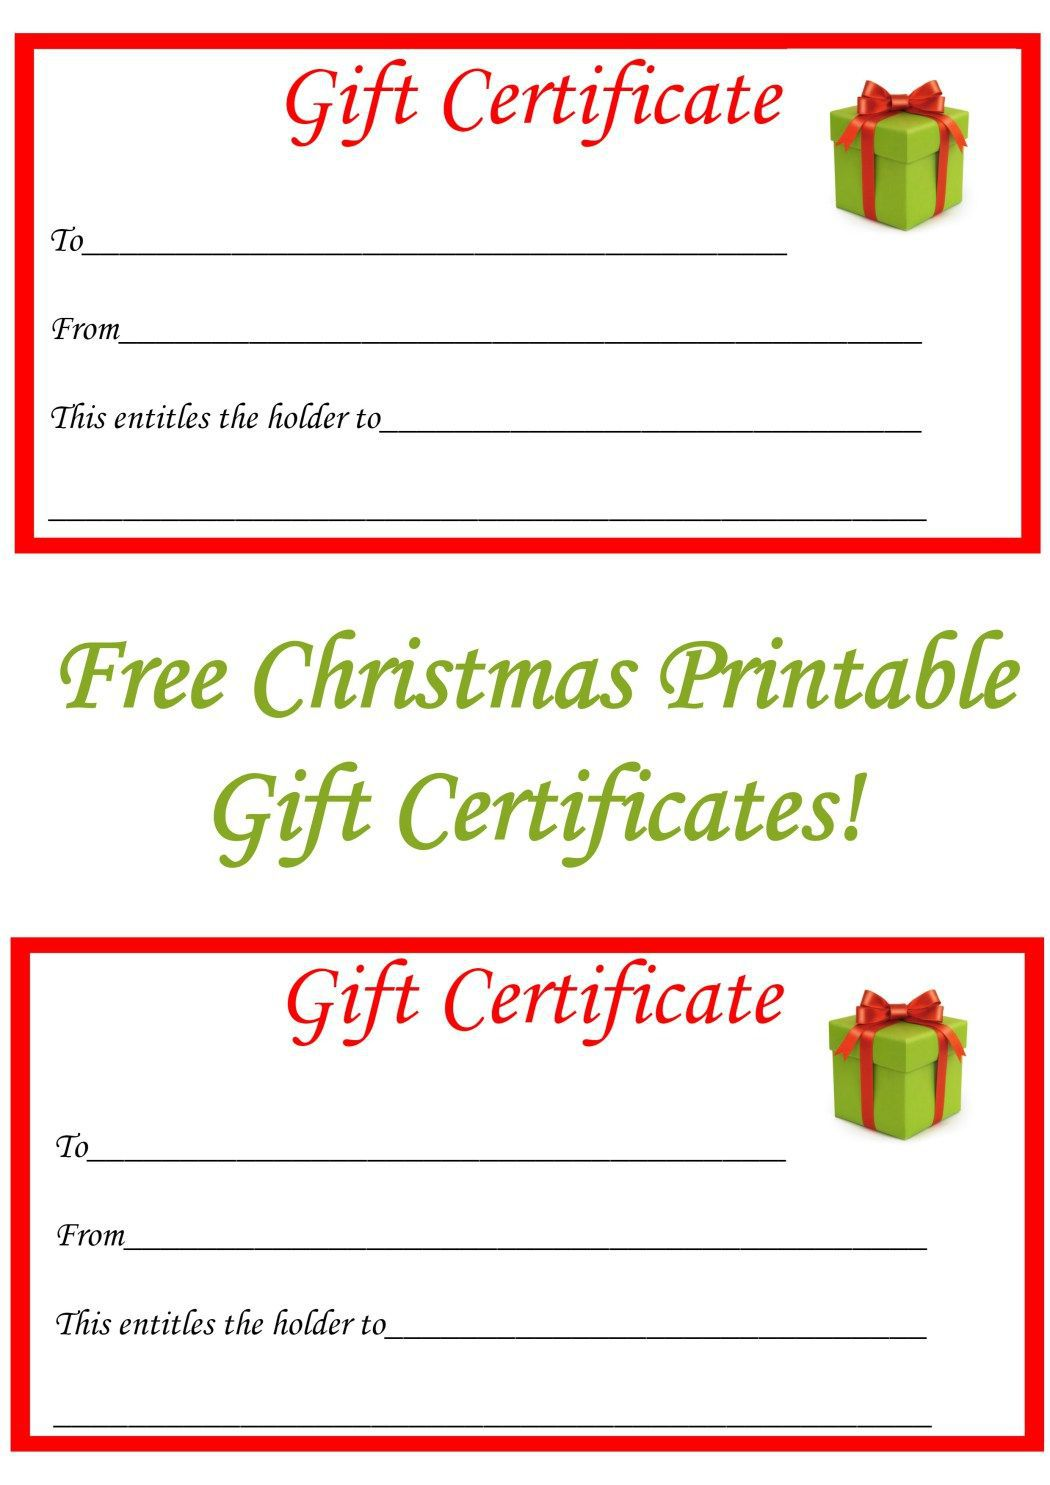 002 Surprising Blank Gift Certificate Template Sample  Free Printable DownloadableFull